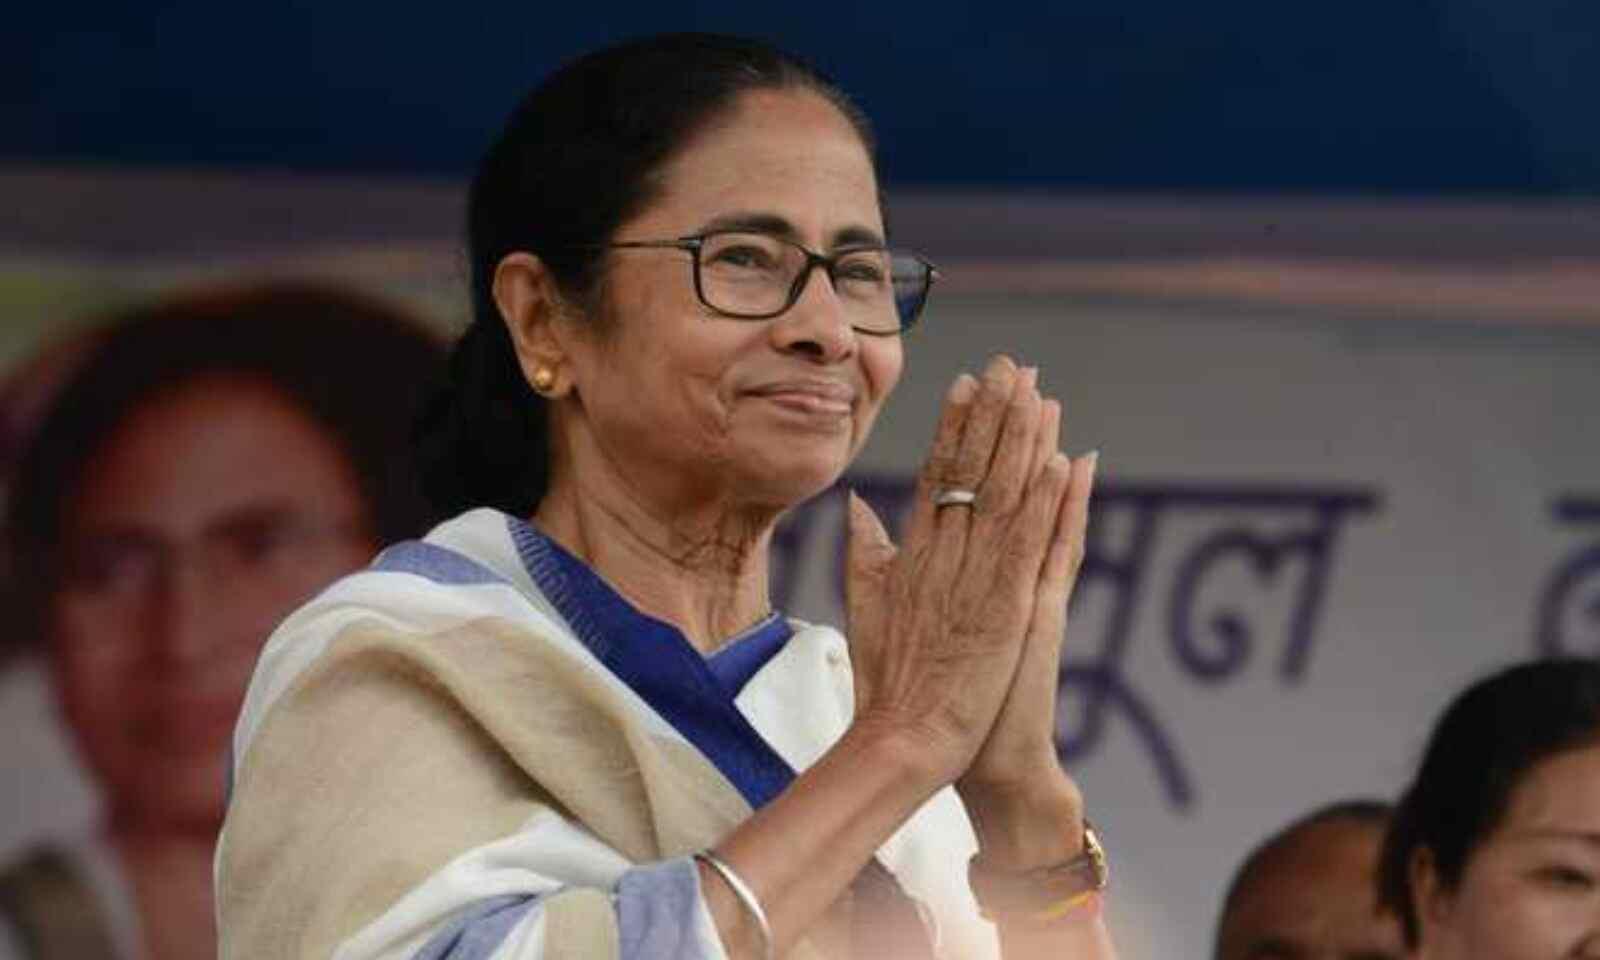 अब ममता बनर्जी ने डाले सनातनी ब्राह्मणों पर डोरे चुनाव से पहले 1000 रूपये मासिक भत्ता देने की घोषणा